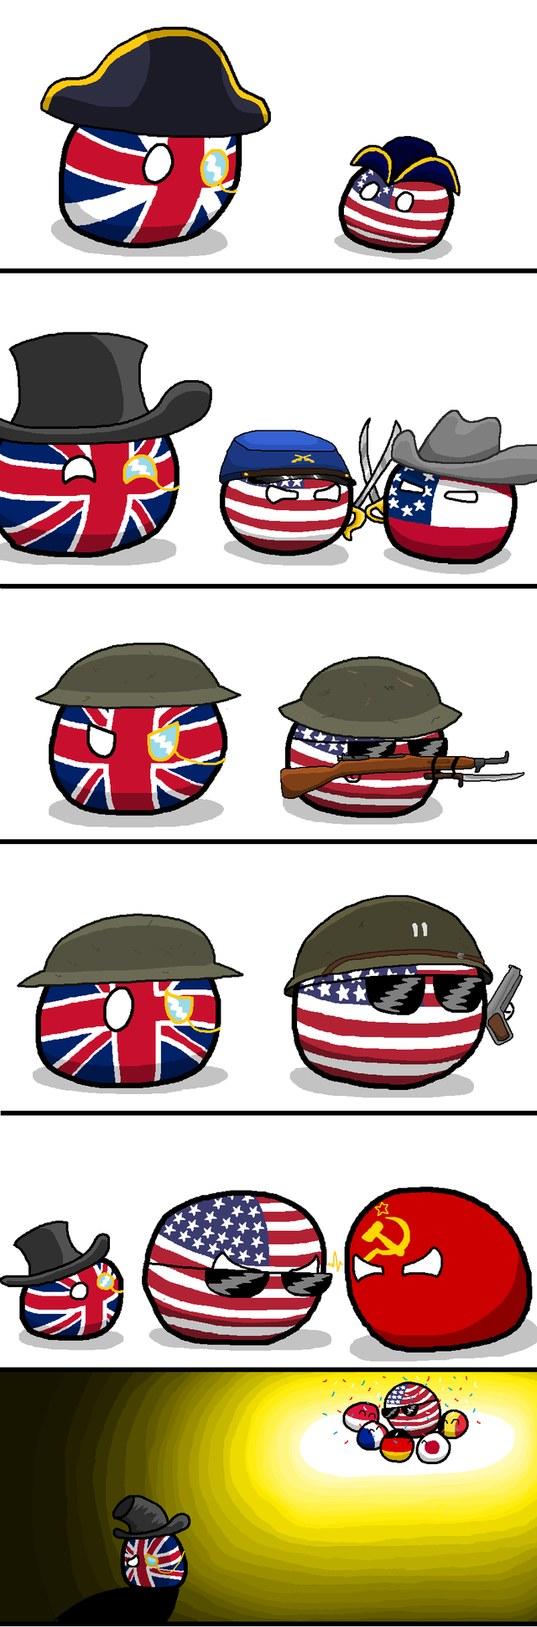 Je préfère la Russie - meme